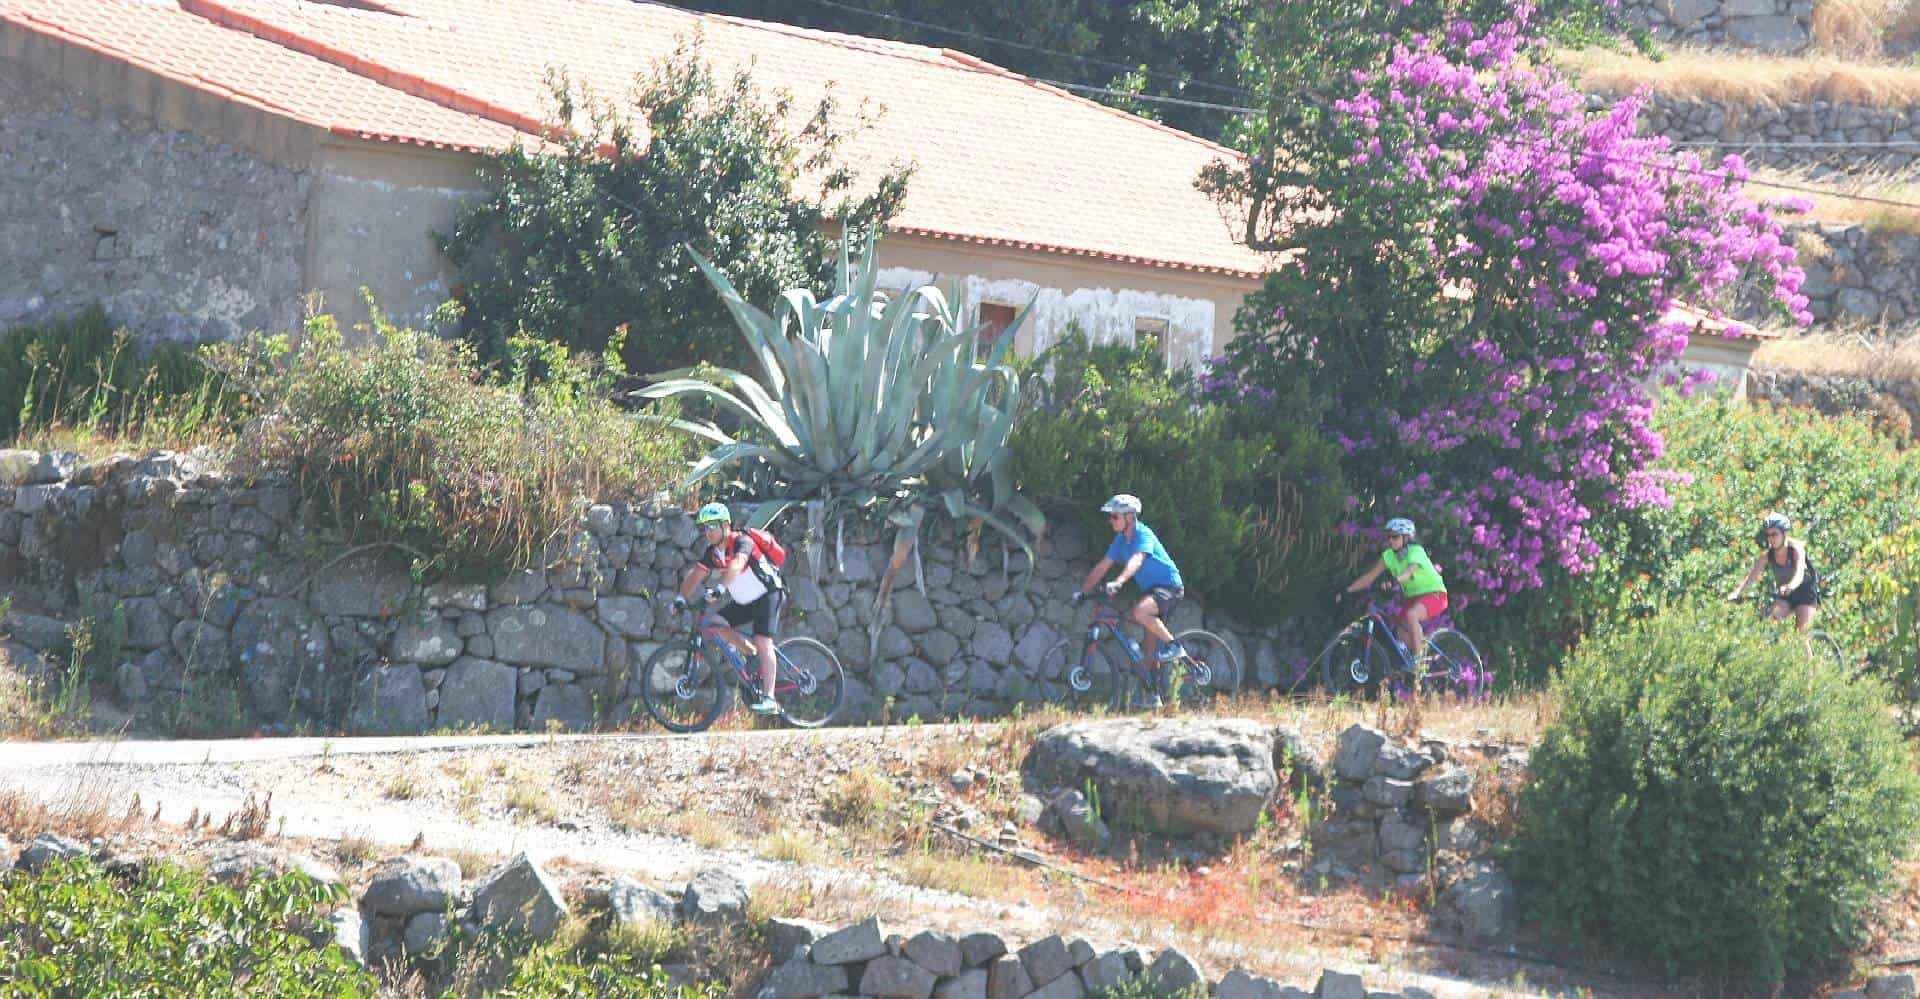 colourful farm with bikes